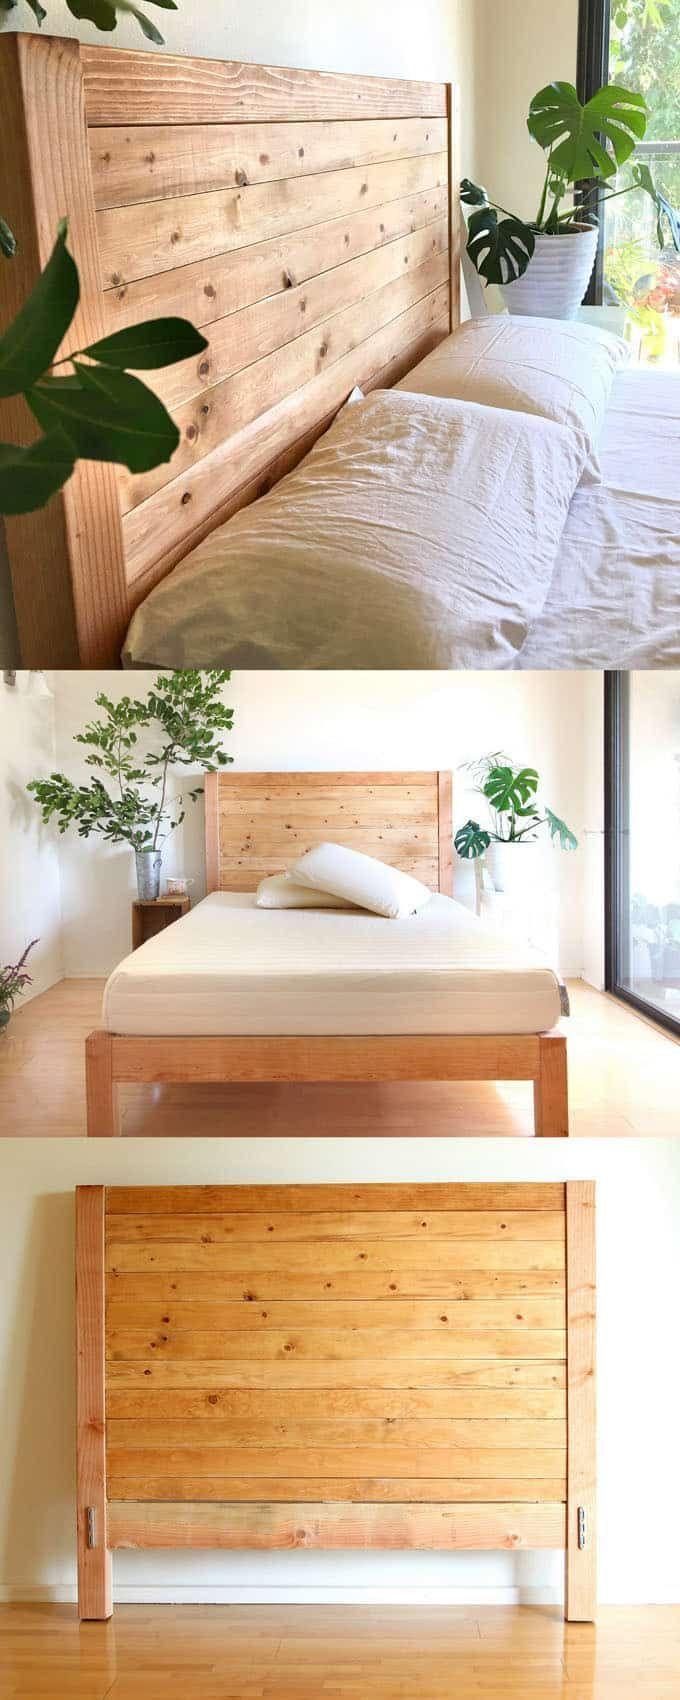 High Quality Build A Beautiful Wood DIY Headboard: Detailed Tutorial U0026  Free Plans For Twin